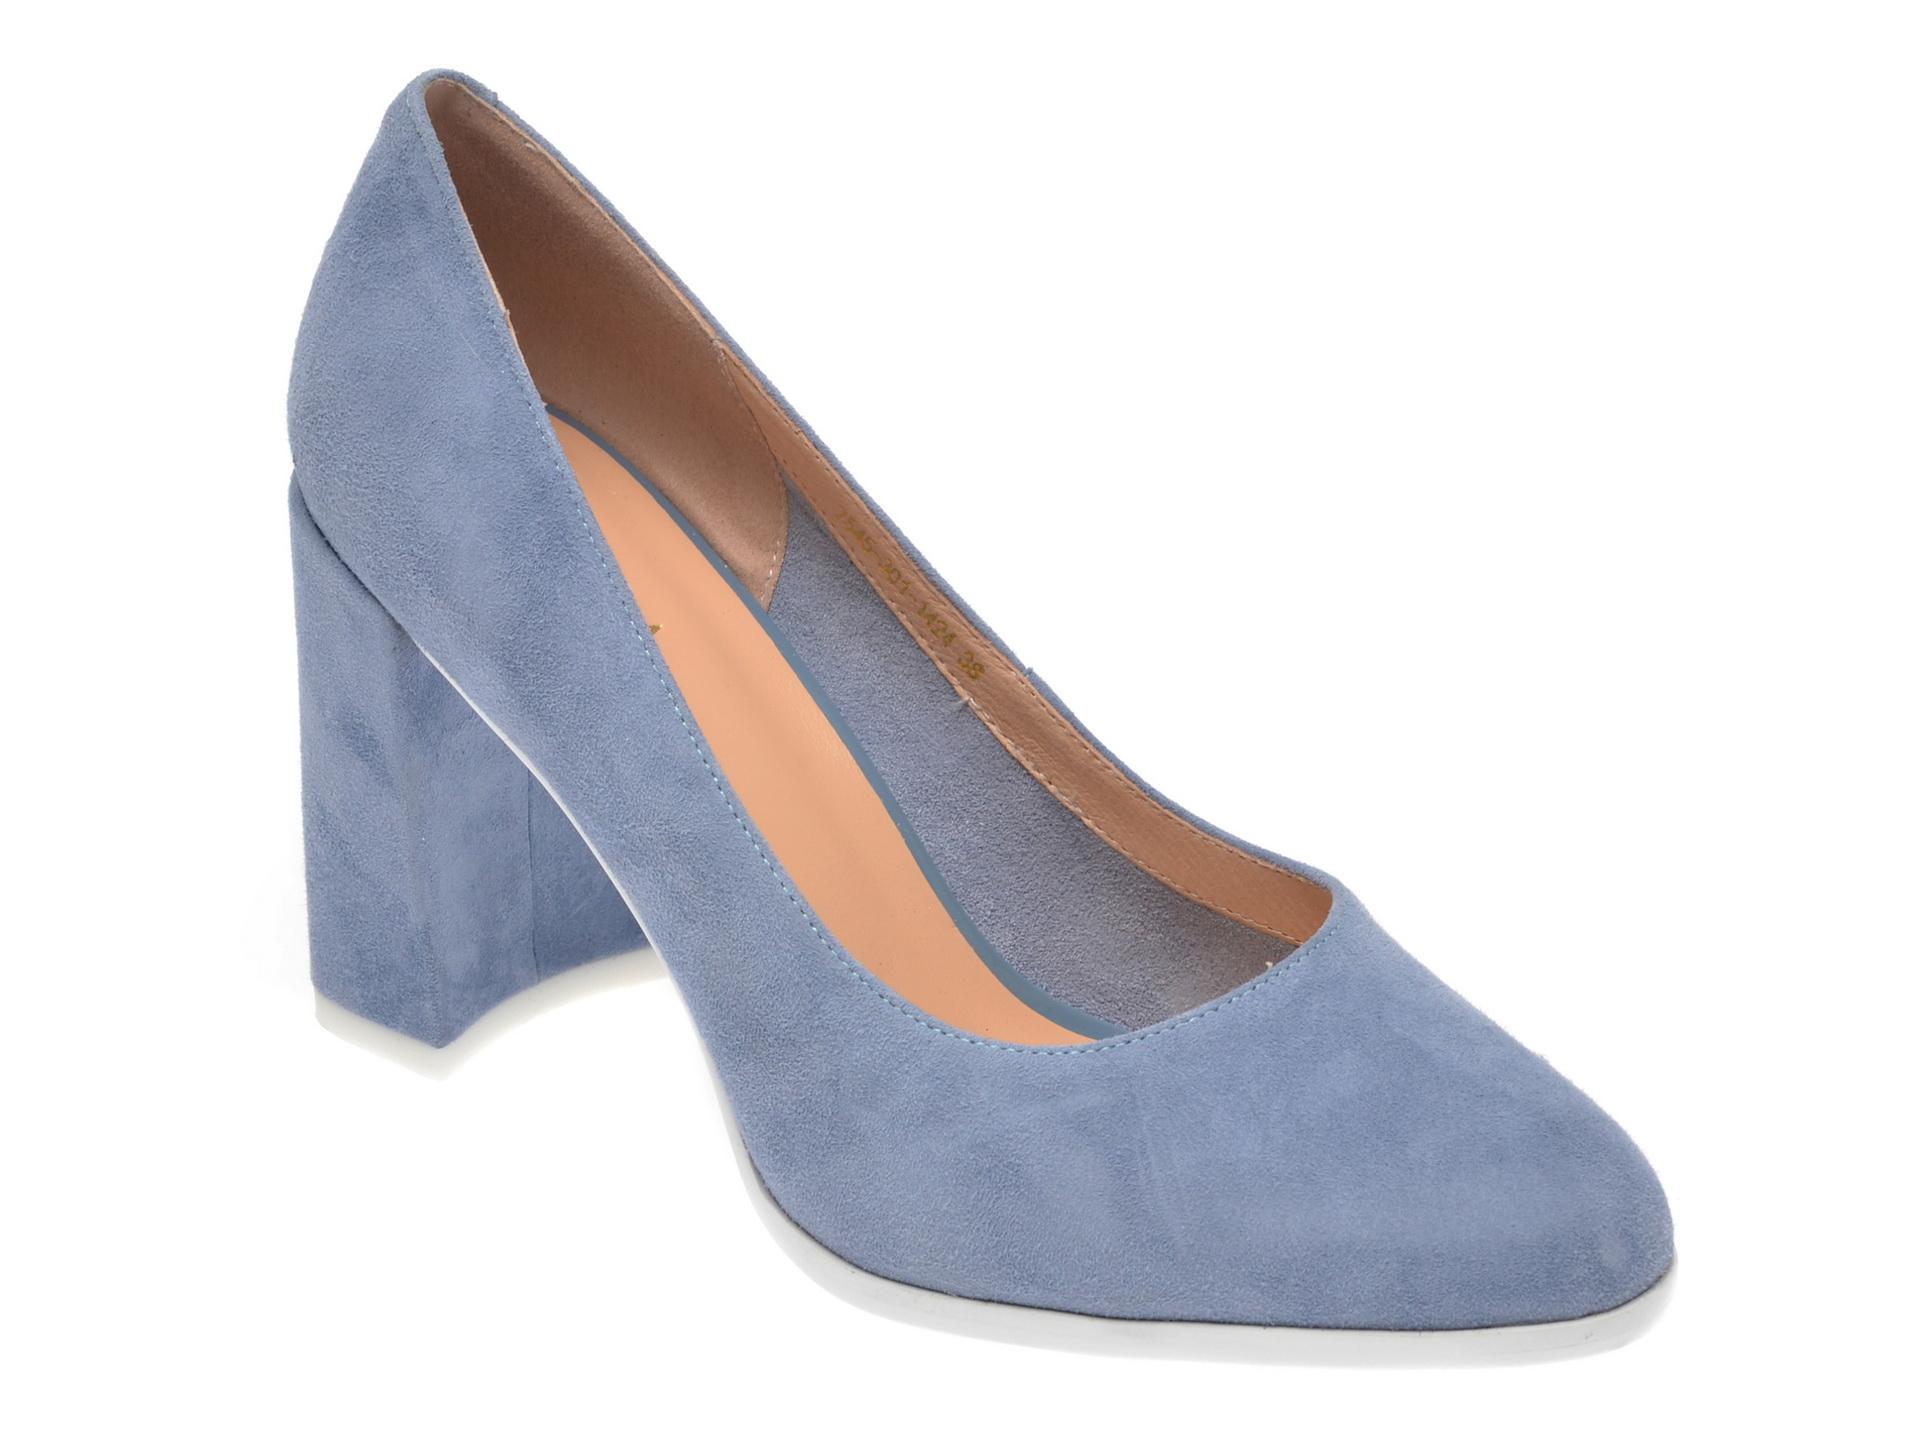 Pantofi EPICA albastri, 7545301, din piele intoarsa imagine